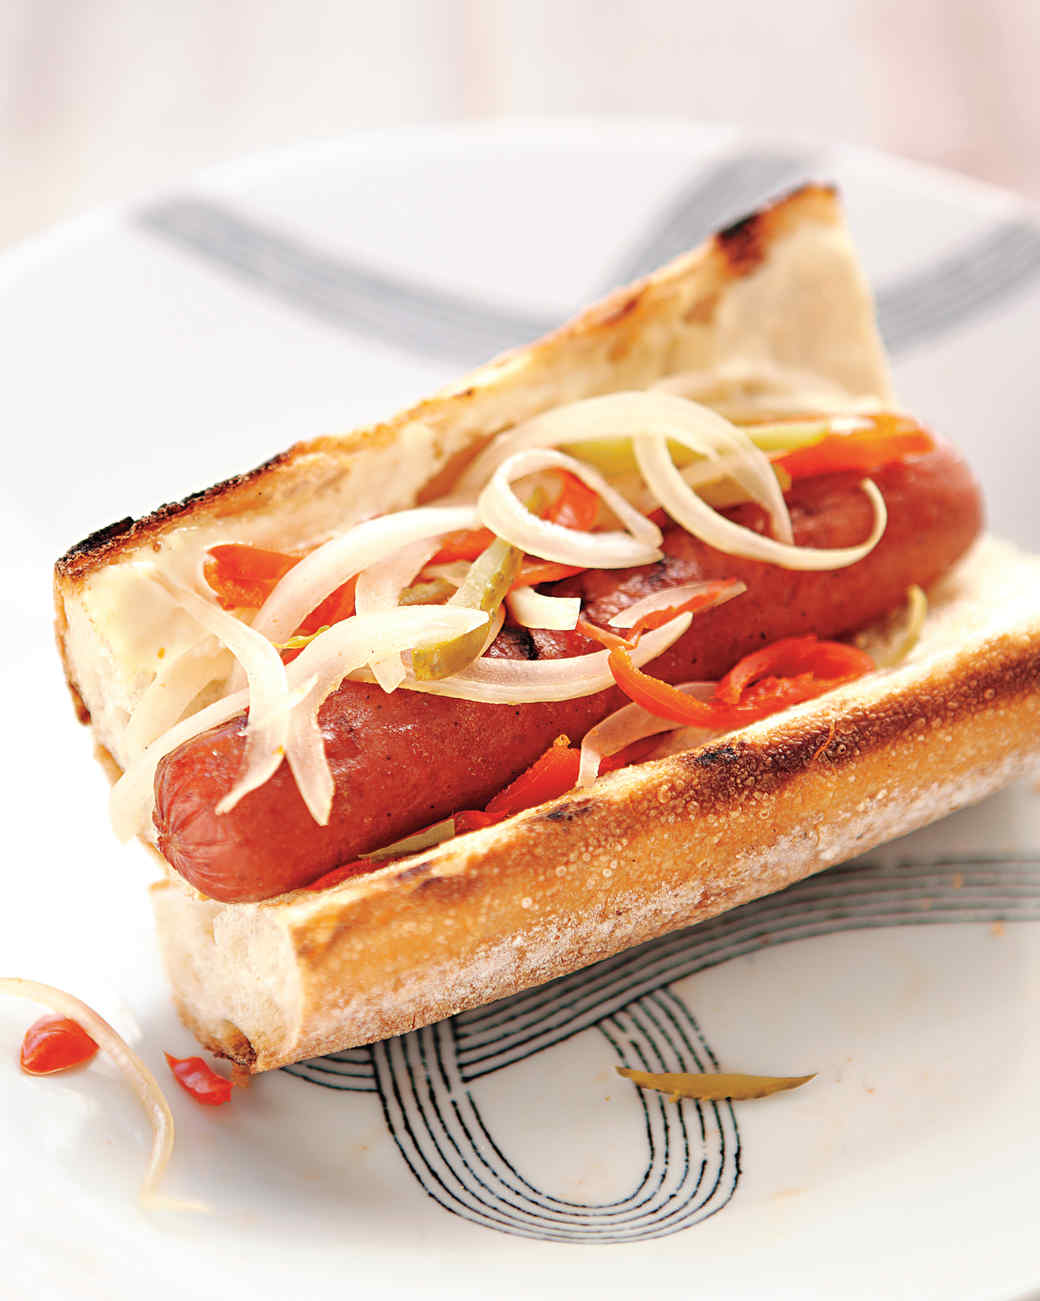 hotdog-324-mld108675.jpg